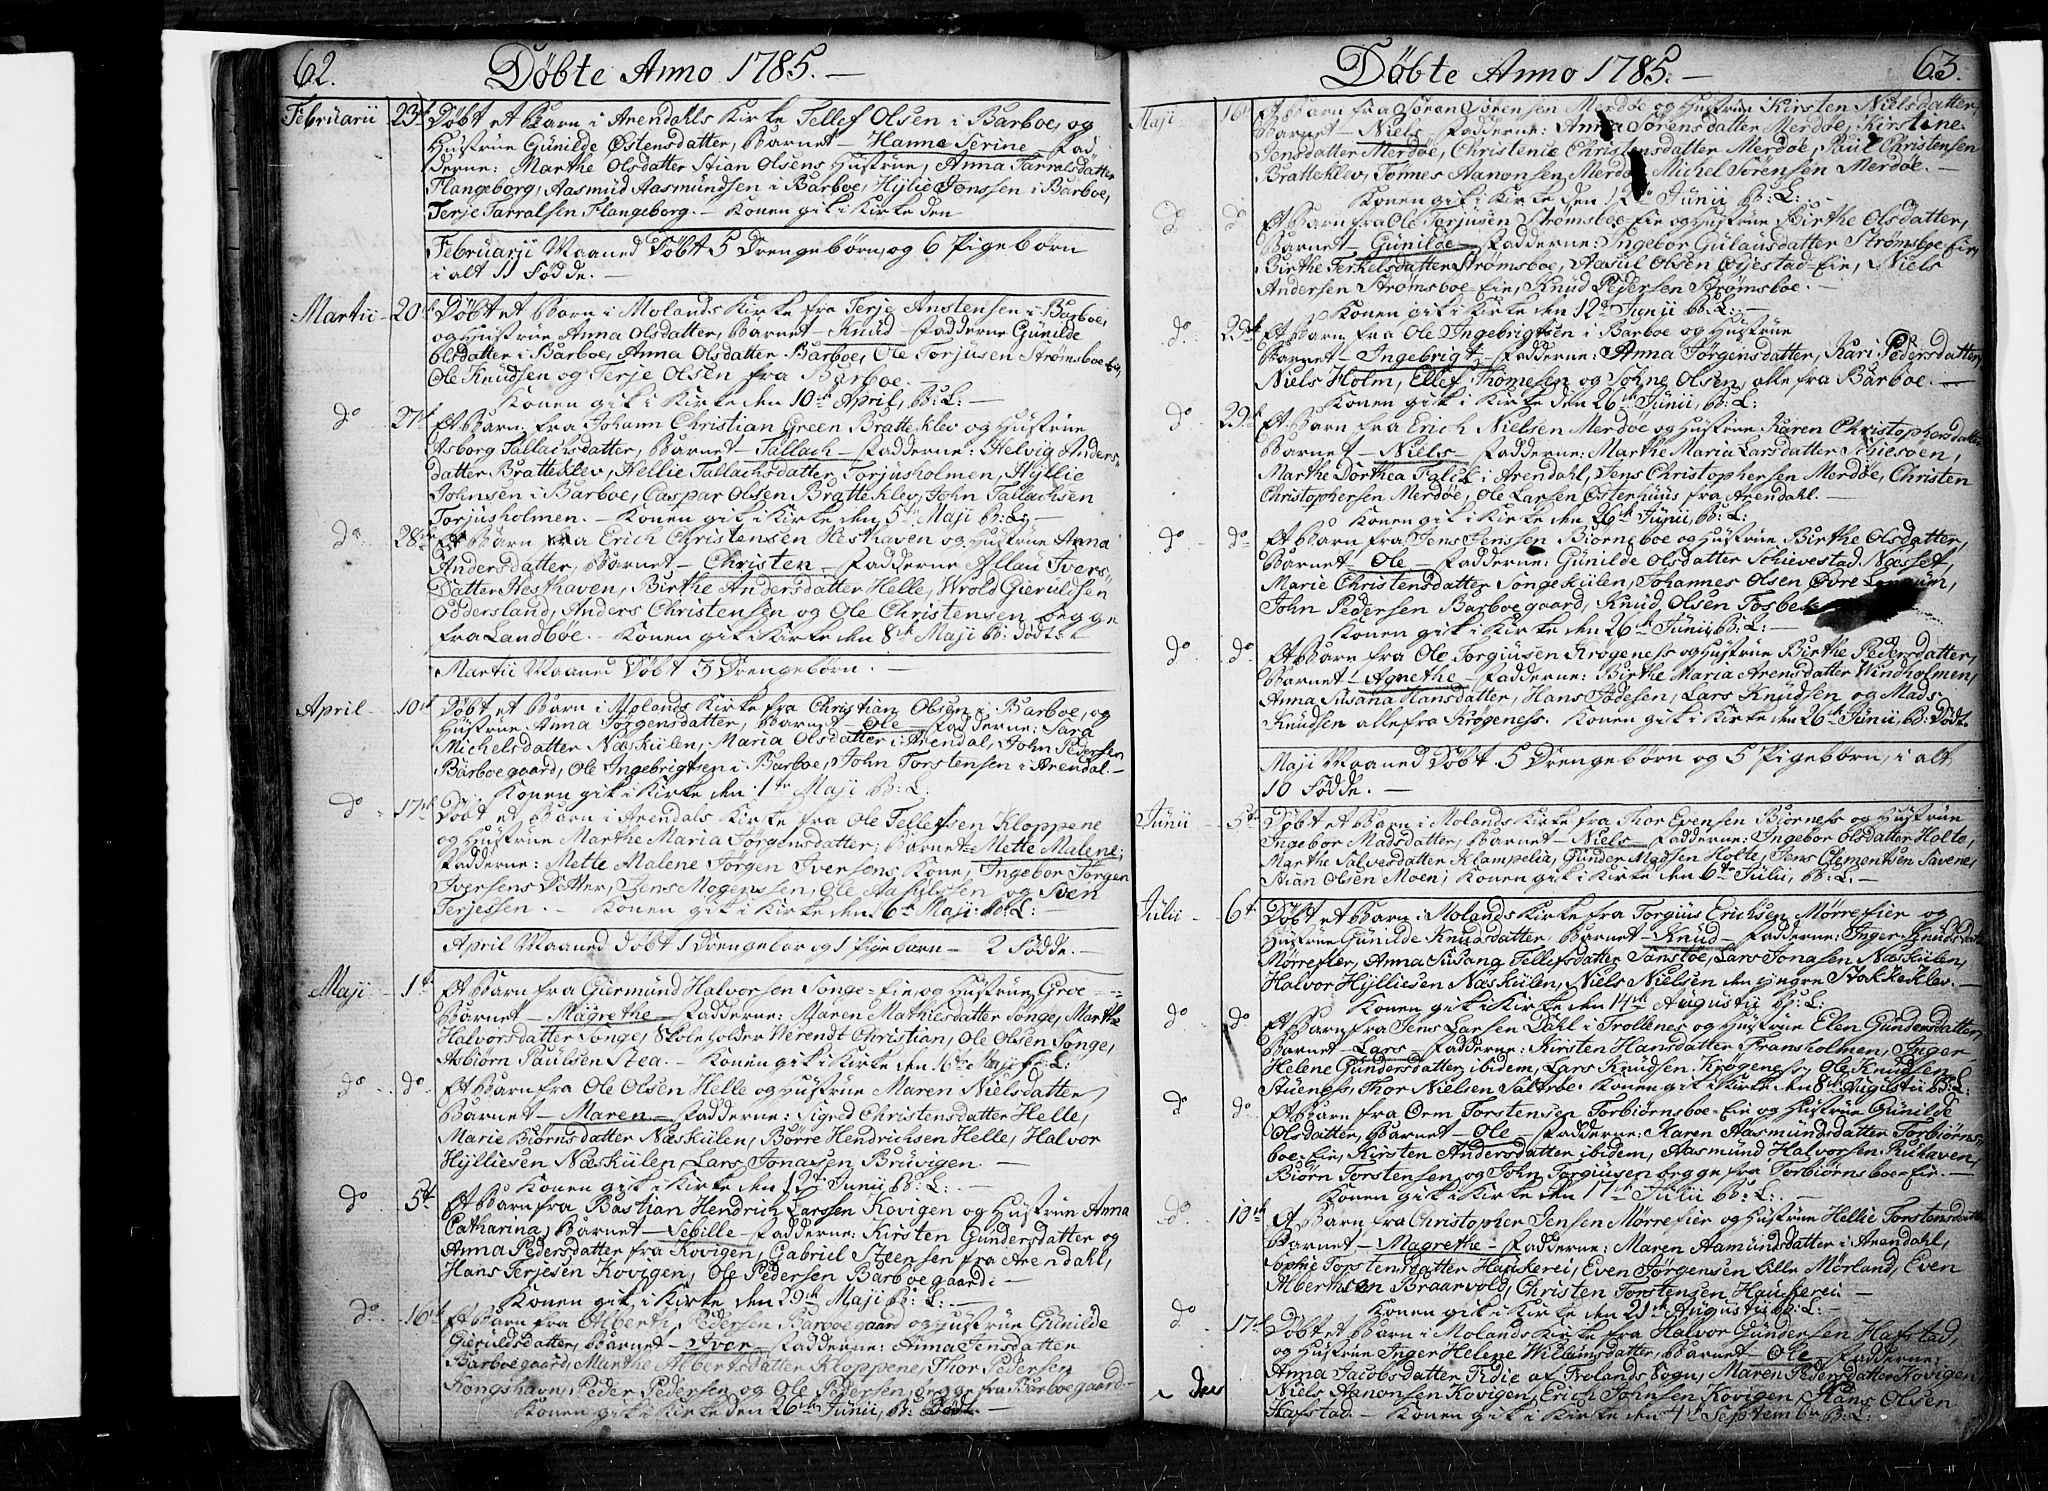 SAK, Tromøy sokneprestkontor, F/Fa/L0002: Ministerialbok nr. A 2, 1773-1808, s. 62-63